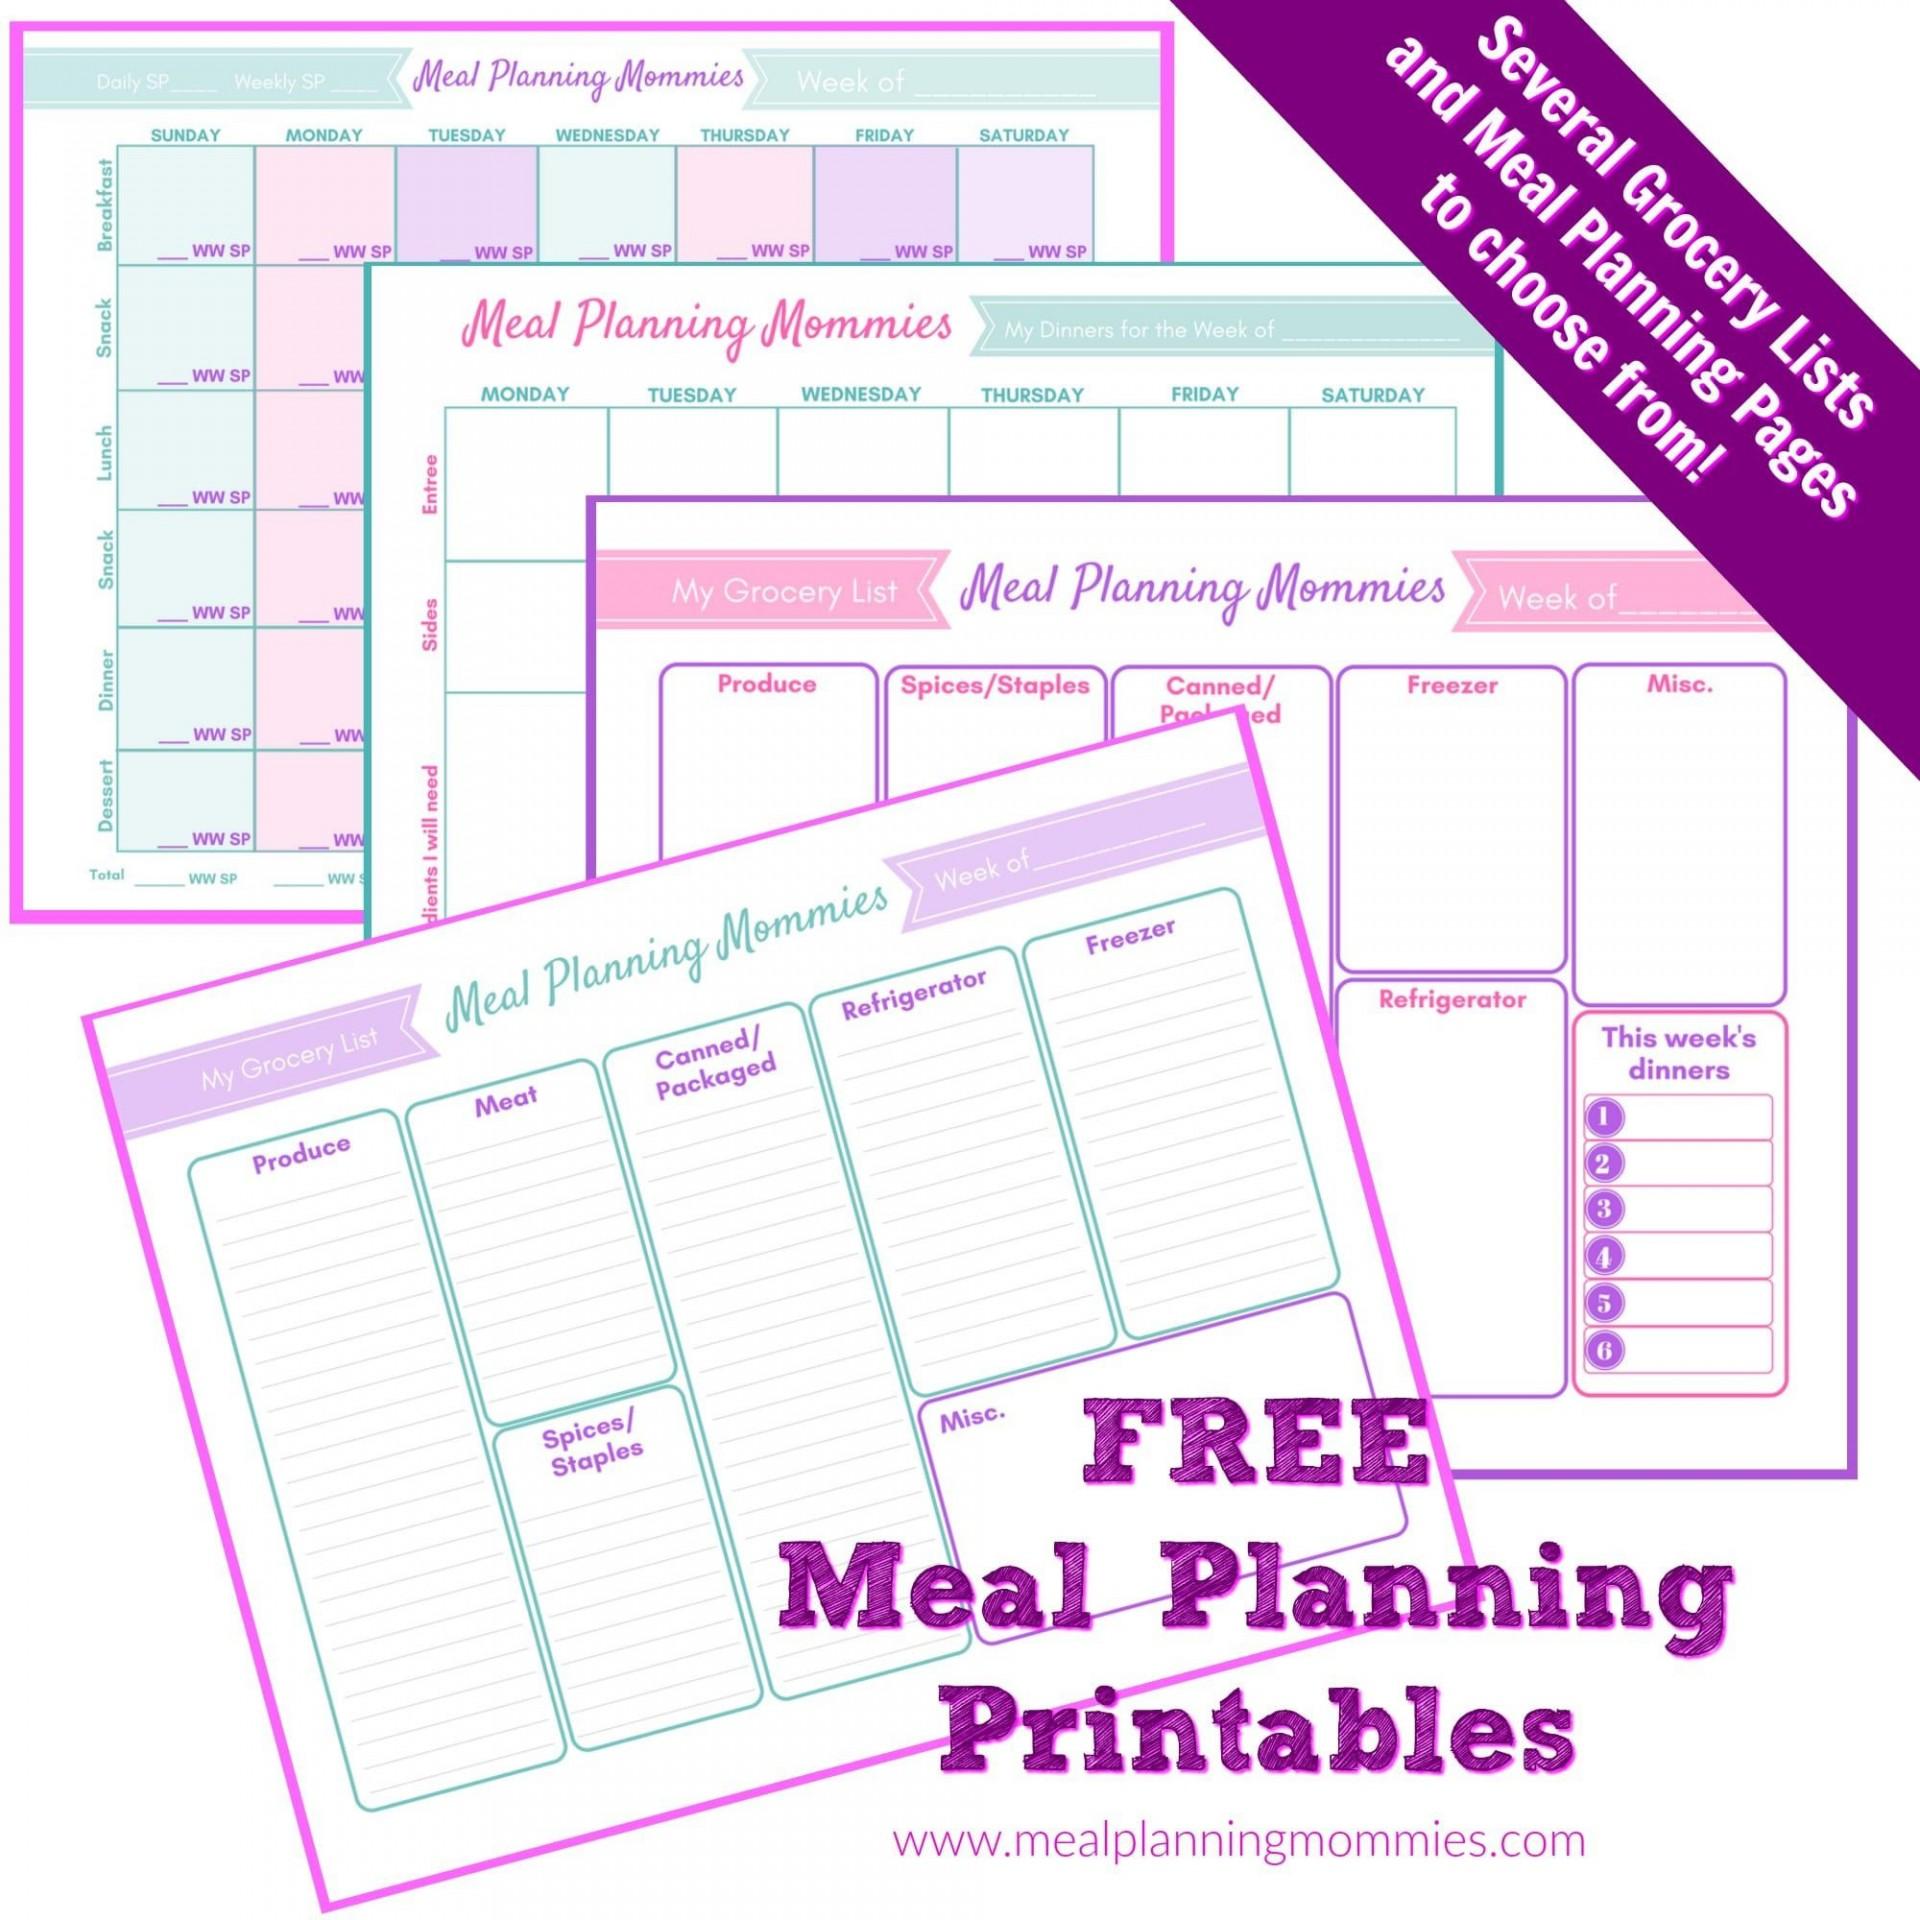 006 Unusual Weekly Meal Planning Worksheet Pdf High Definition  Free1920